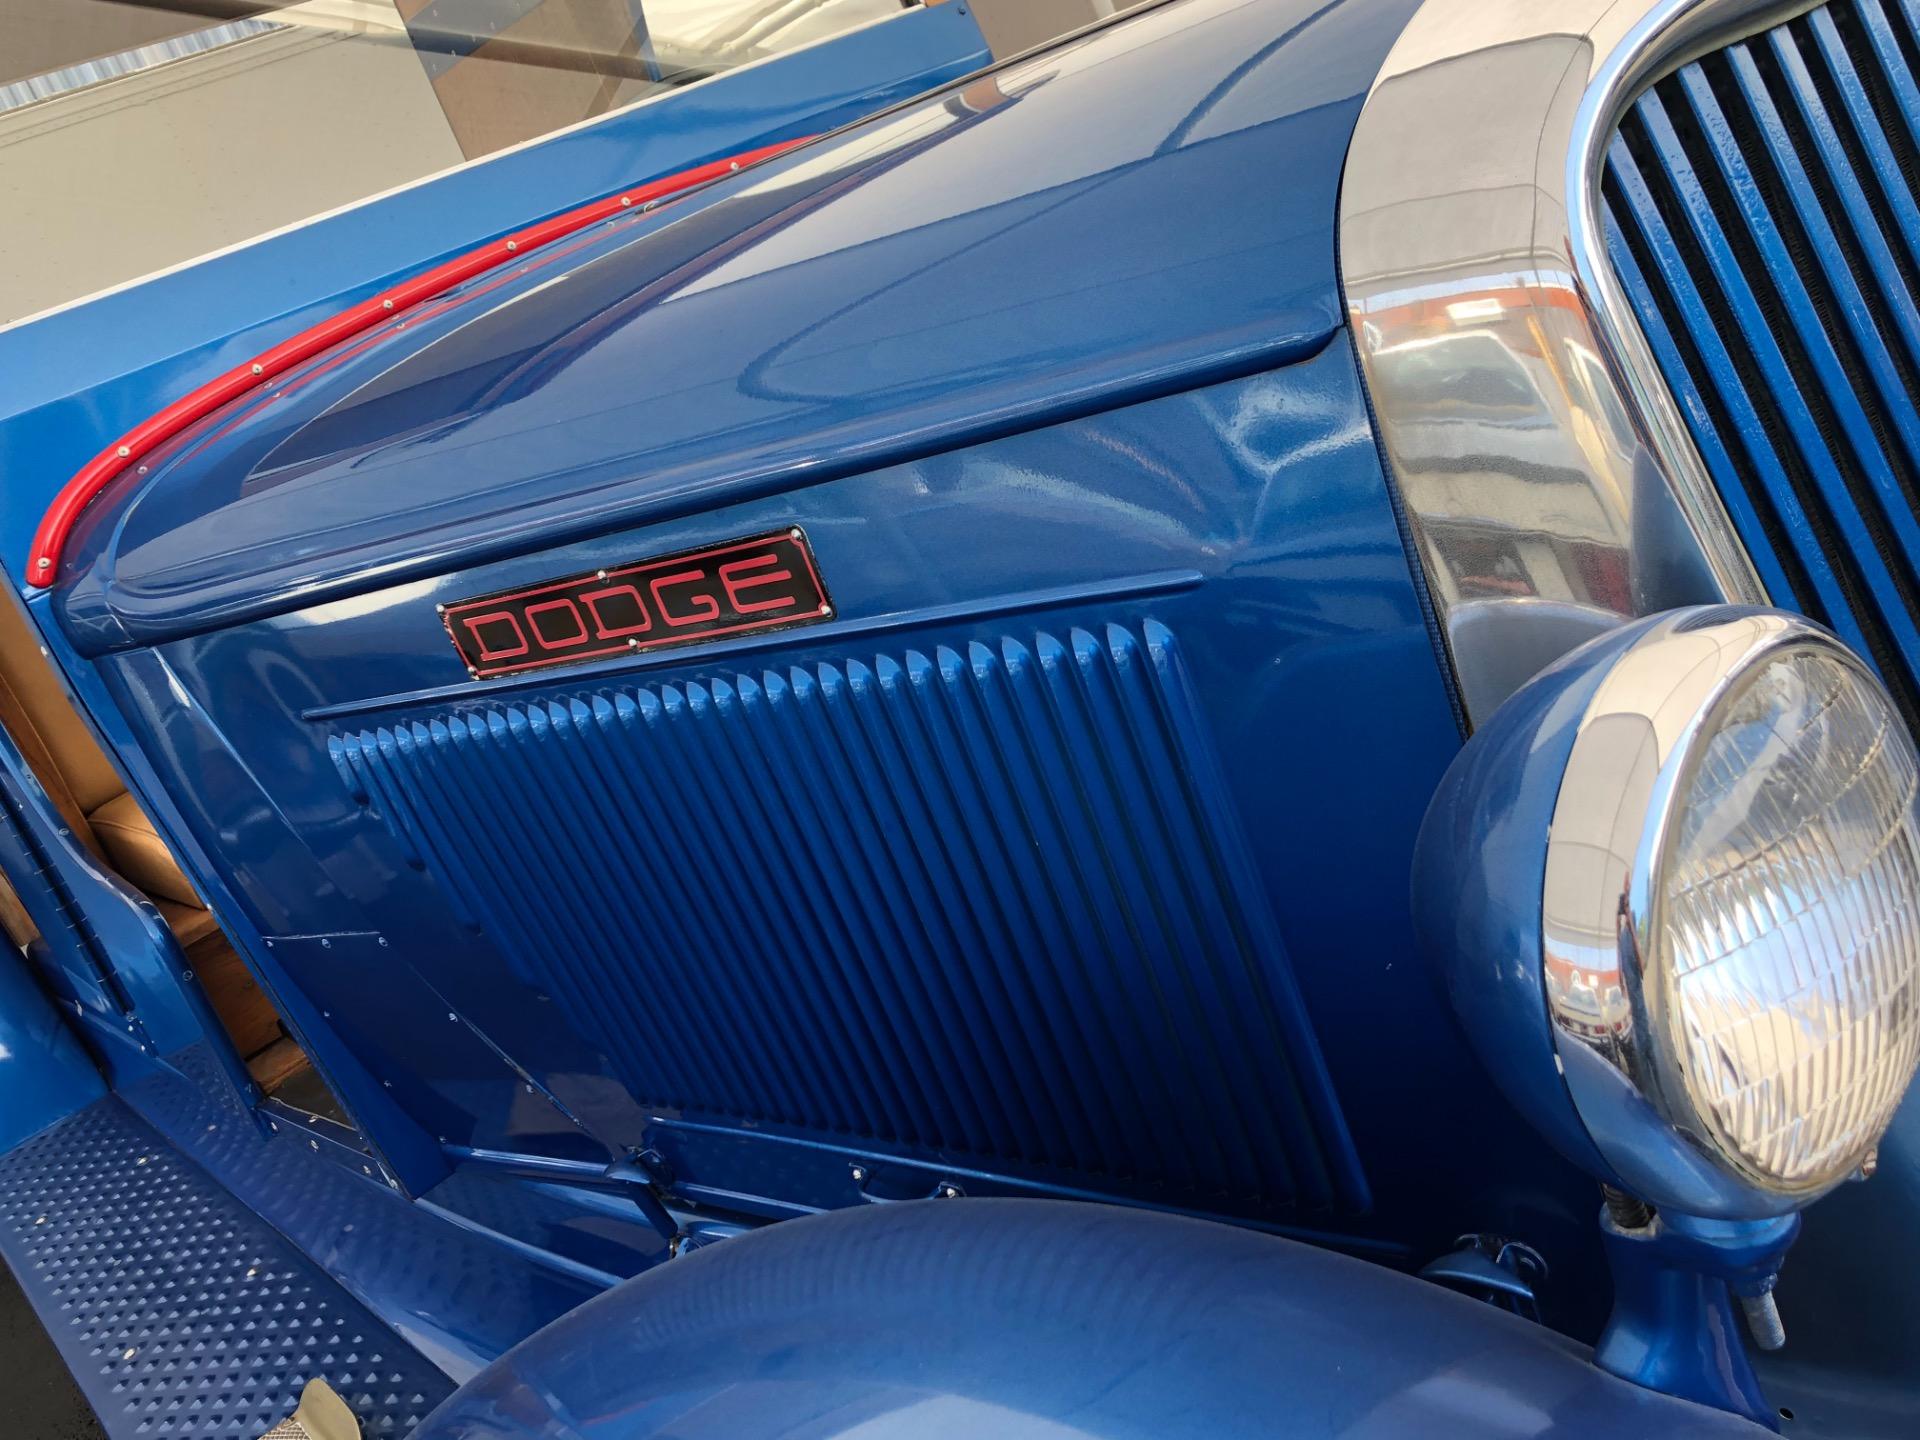 Used 1935 Dodge Truck